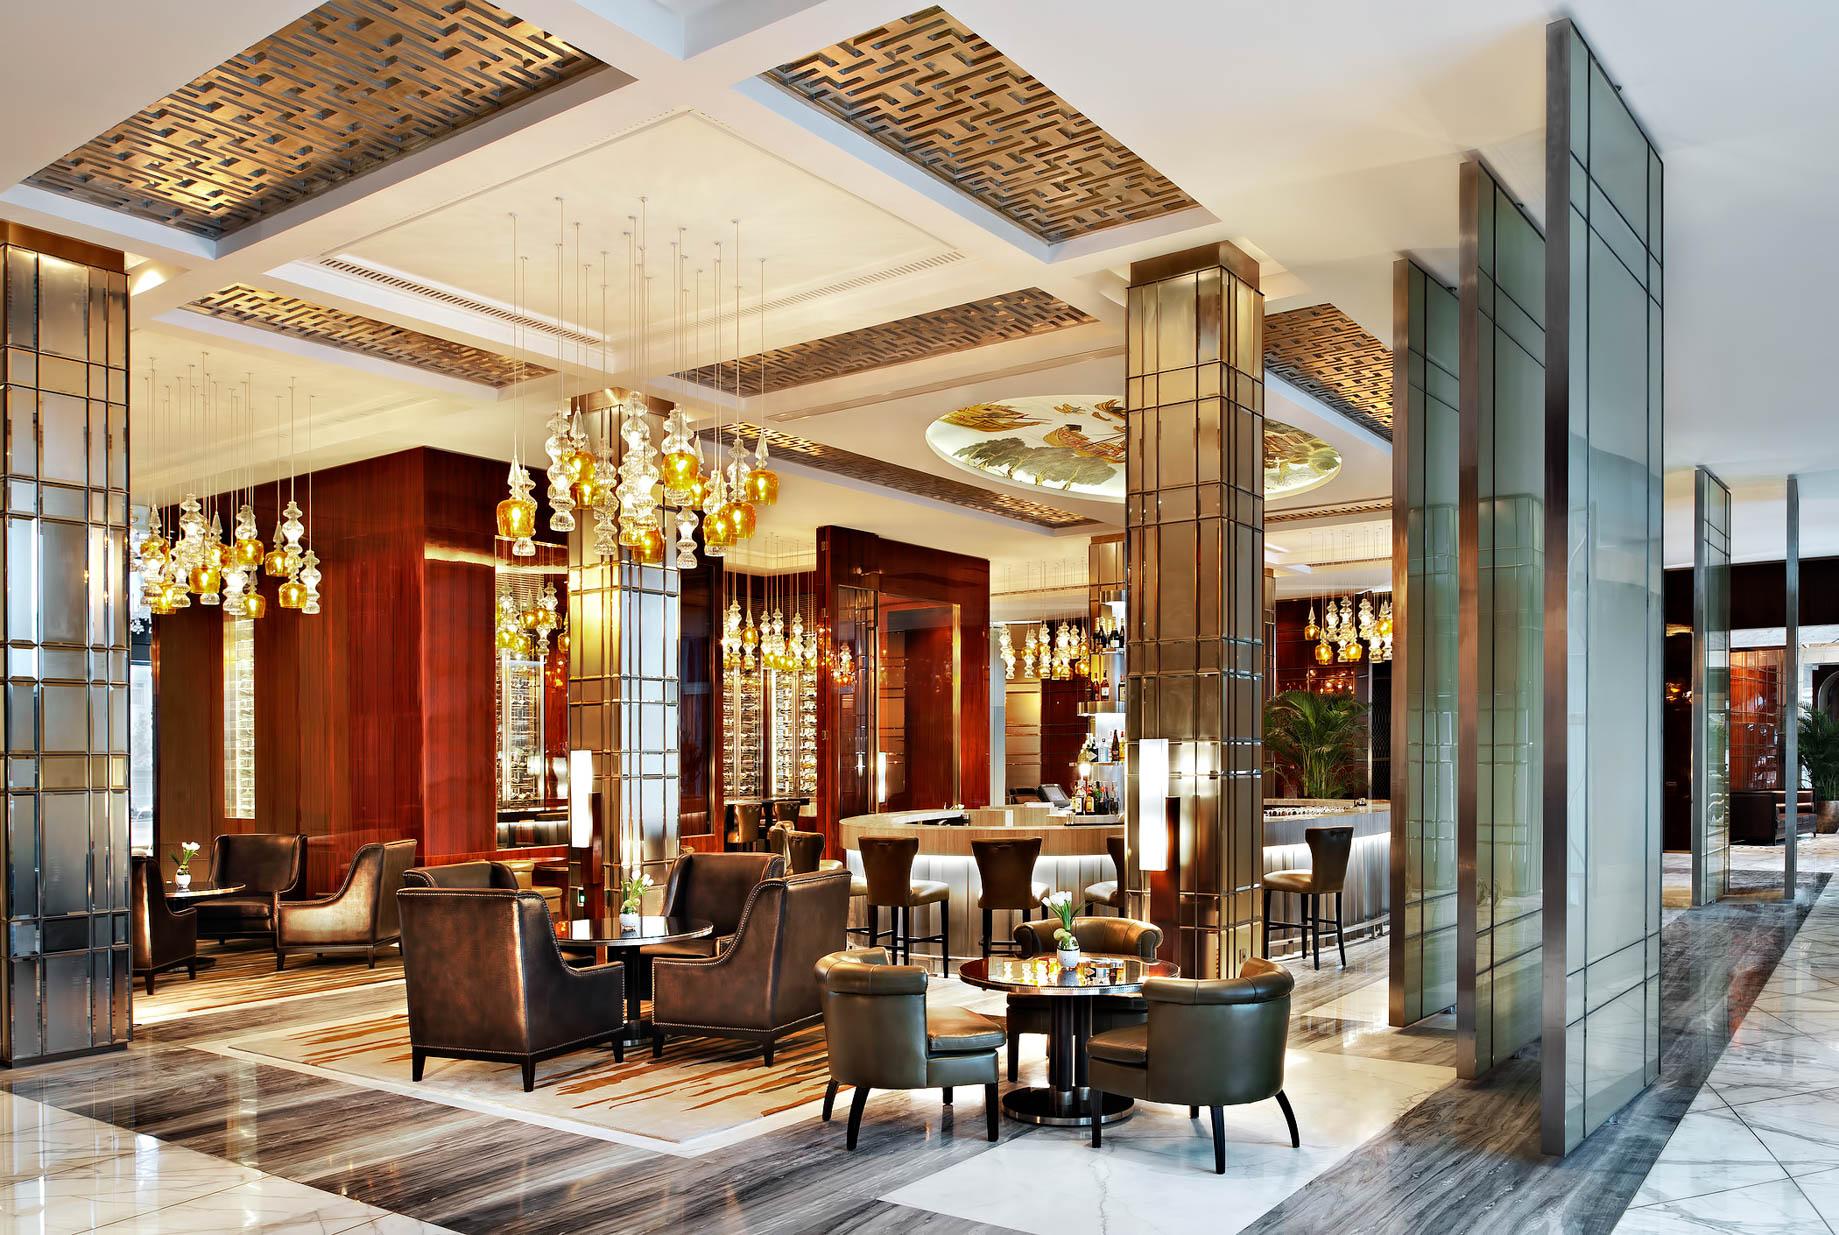 The St. Regis Tianjin Luxury Hotel - Tianjin, China - St. Regis Bar